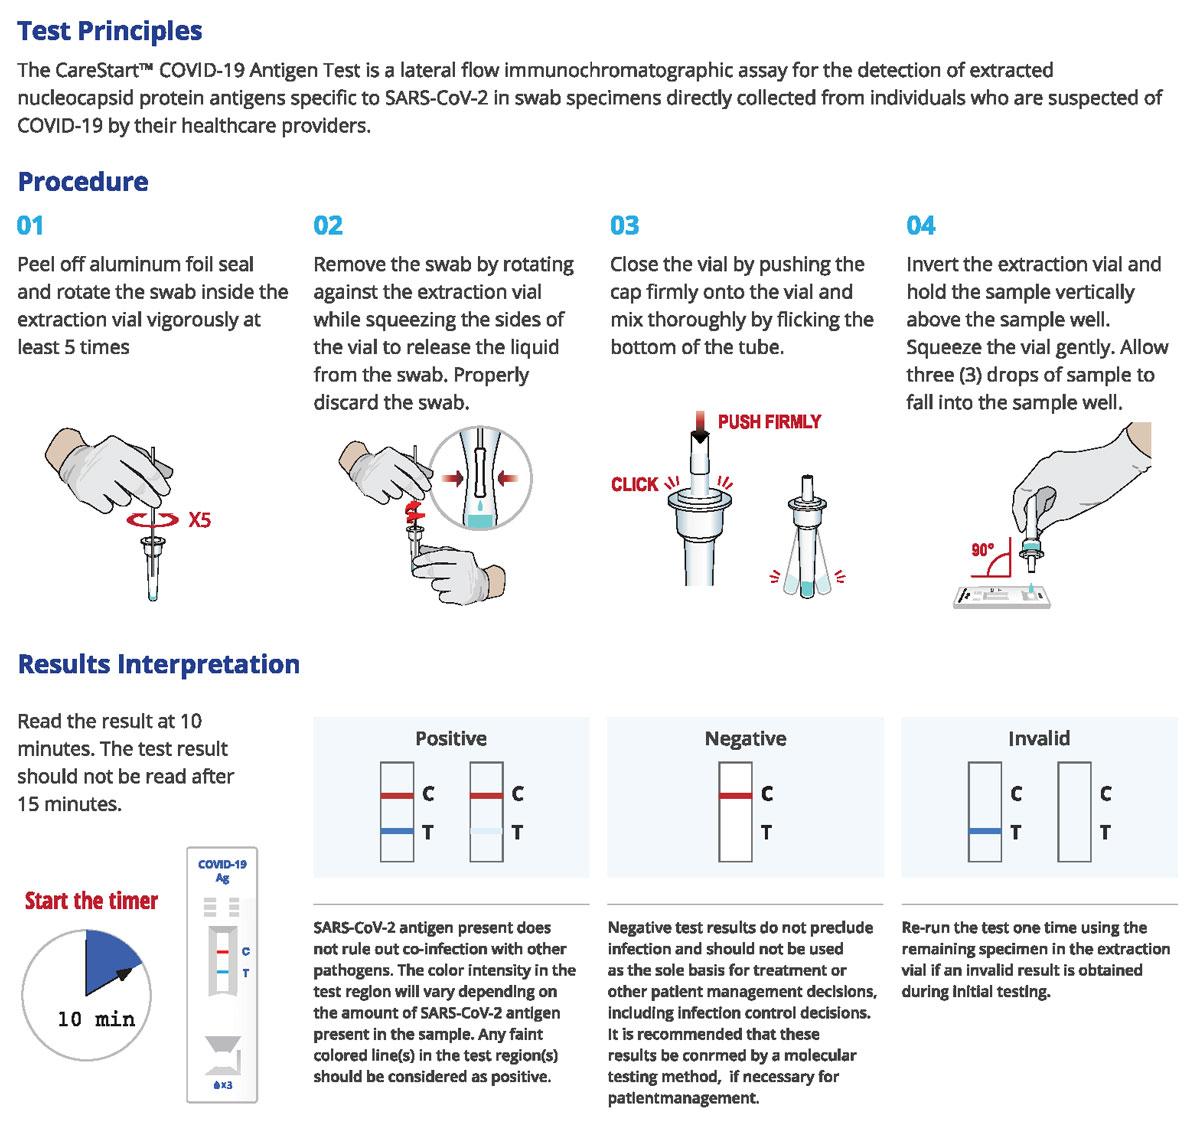 CareStart Antigen Procedure